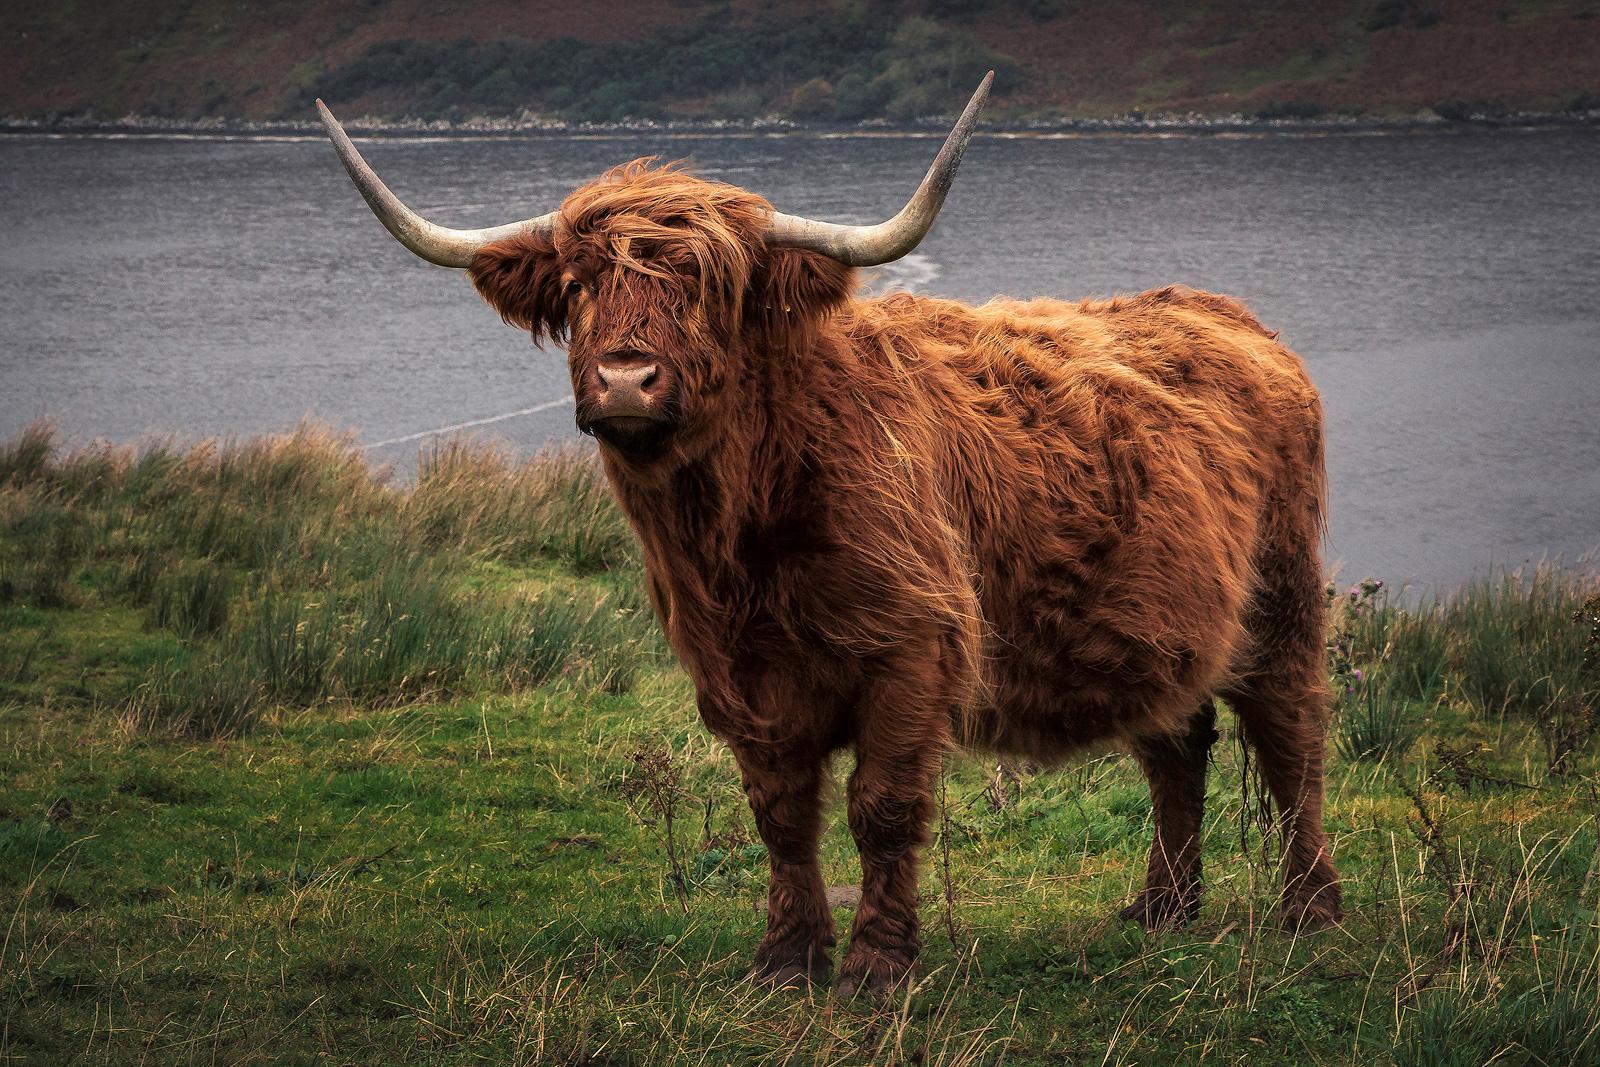 Kuh, Highland Cow, Reisebericht Isle of Skye, Schottland, Jaworskyj, Lukas Voegelin, abenteuerfotoreisen, kathrinsworld, Kathrin's World